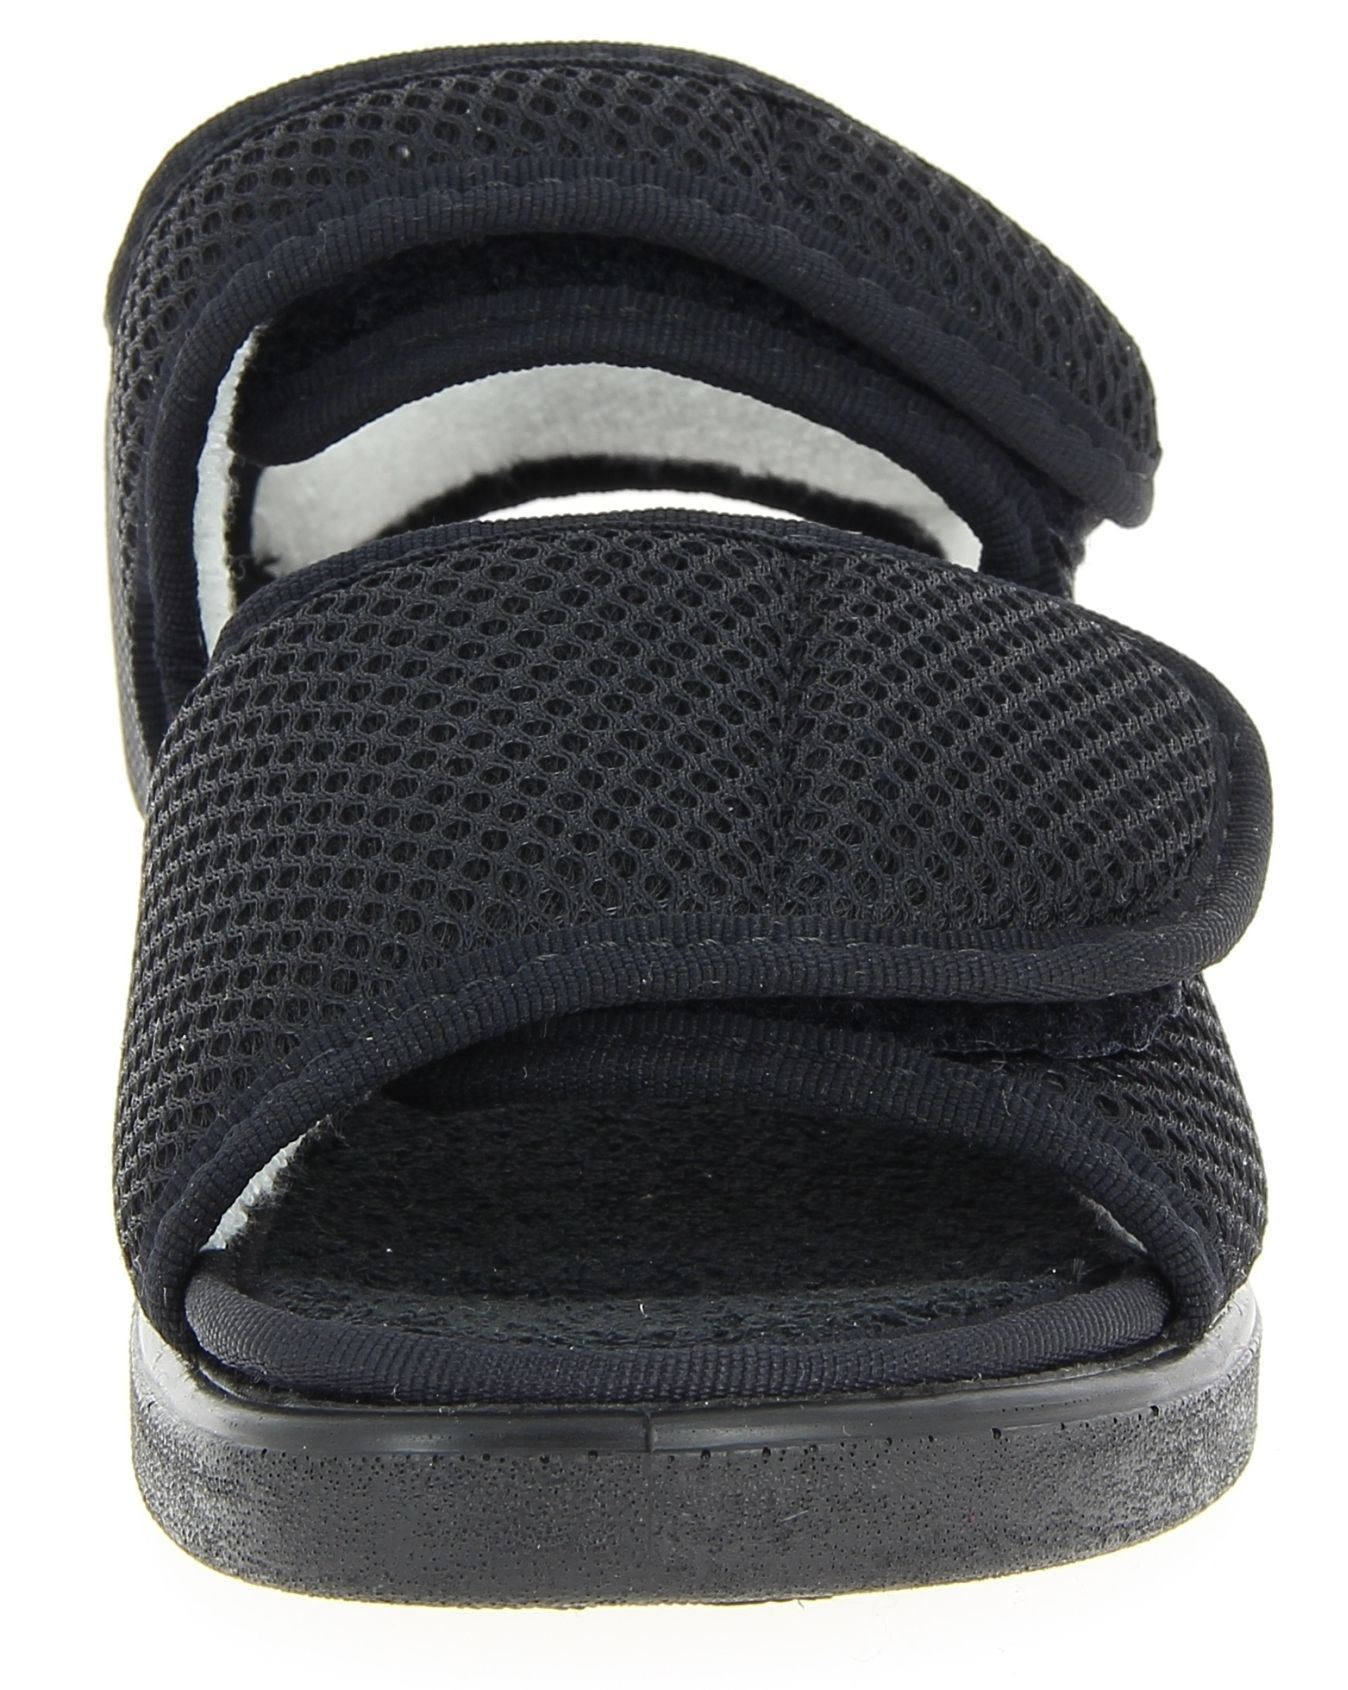 mode f r seniorinnen und senioren shop mode homeserviceleichte sandale genf varomed 58892. Black Bedroom Furniture Sets. Home Design Ideas